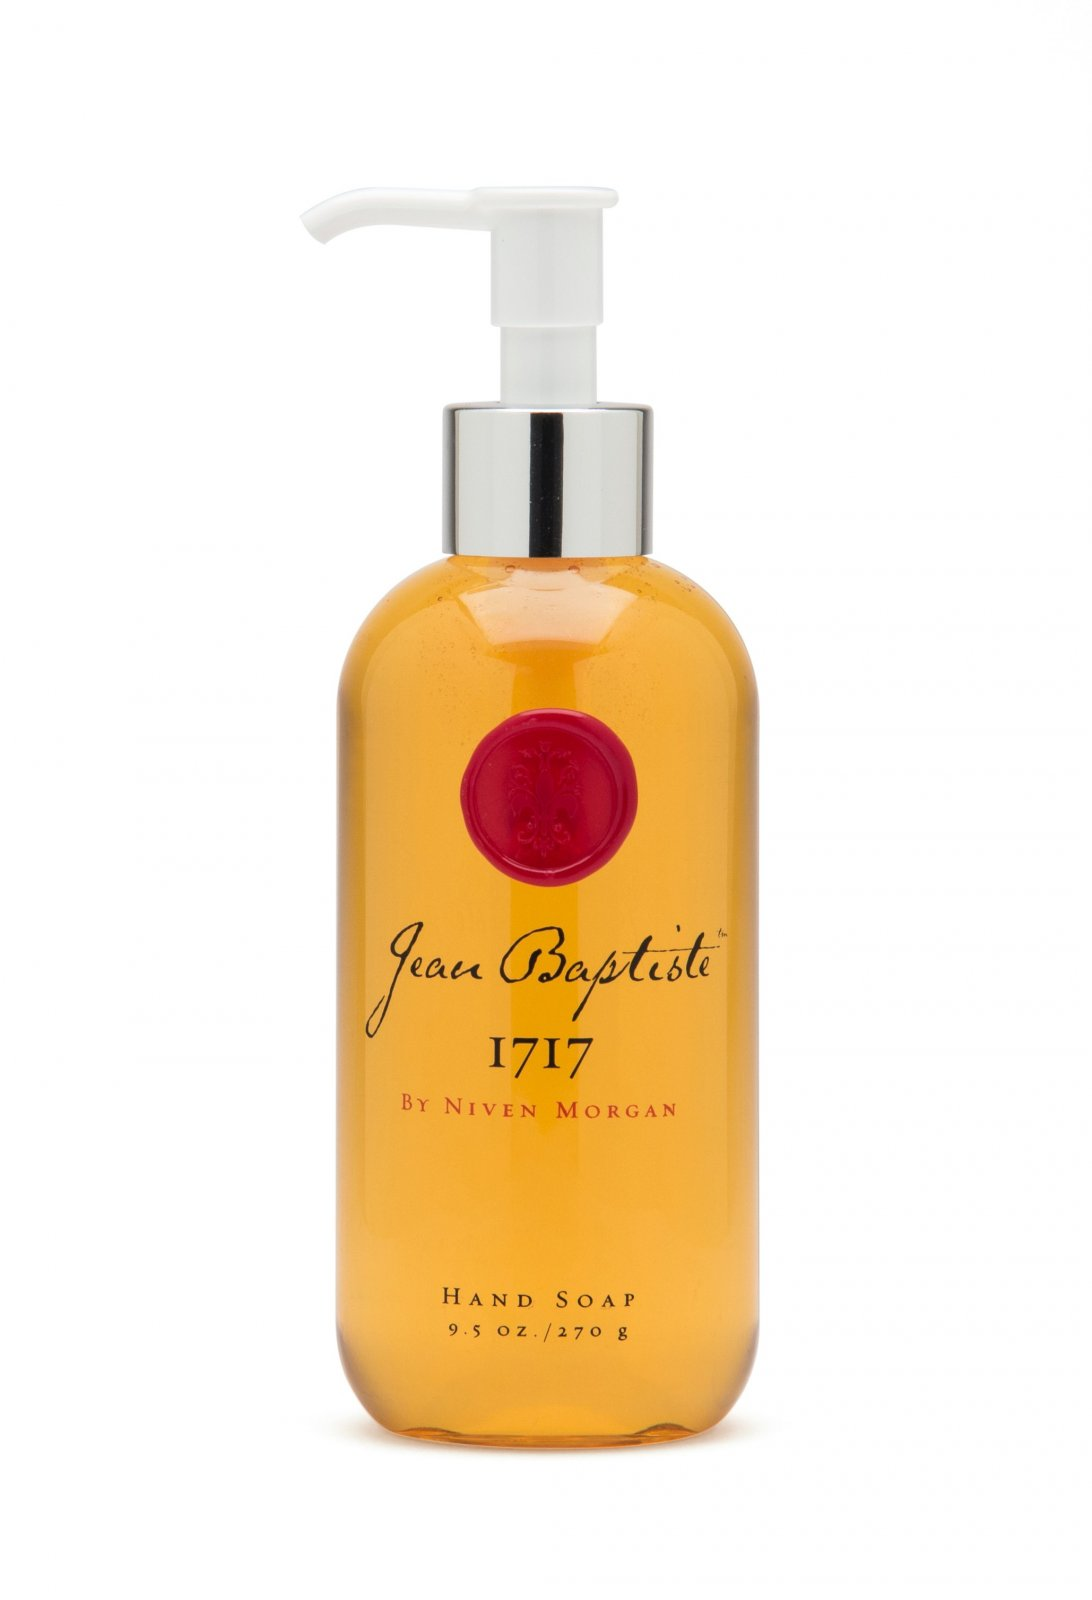 Jean Baptiste Hand Soap